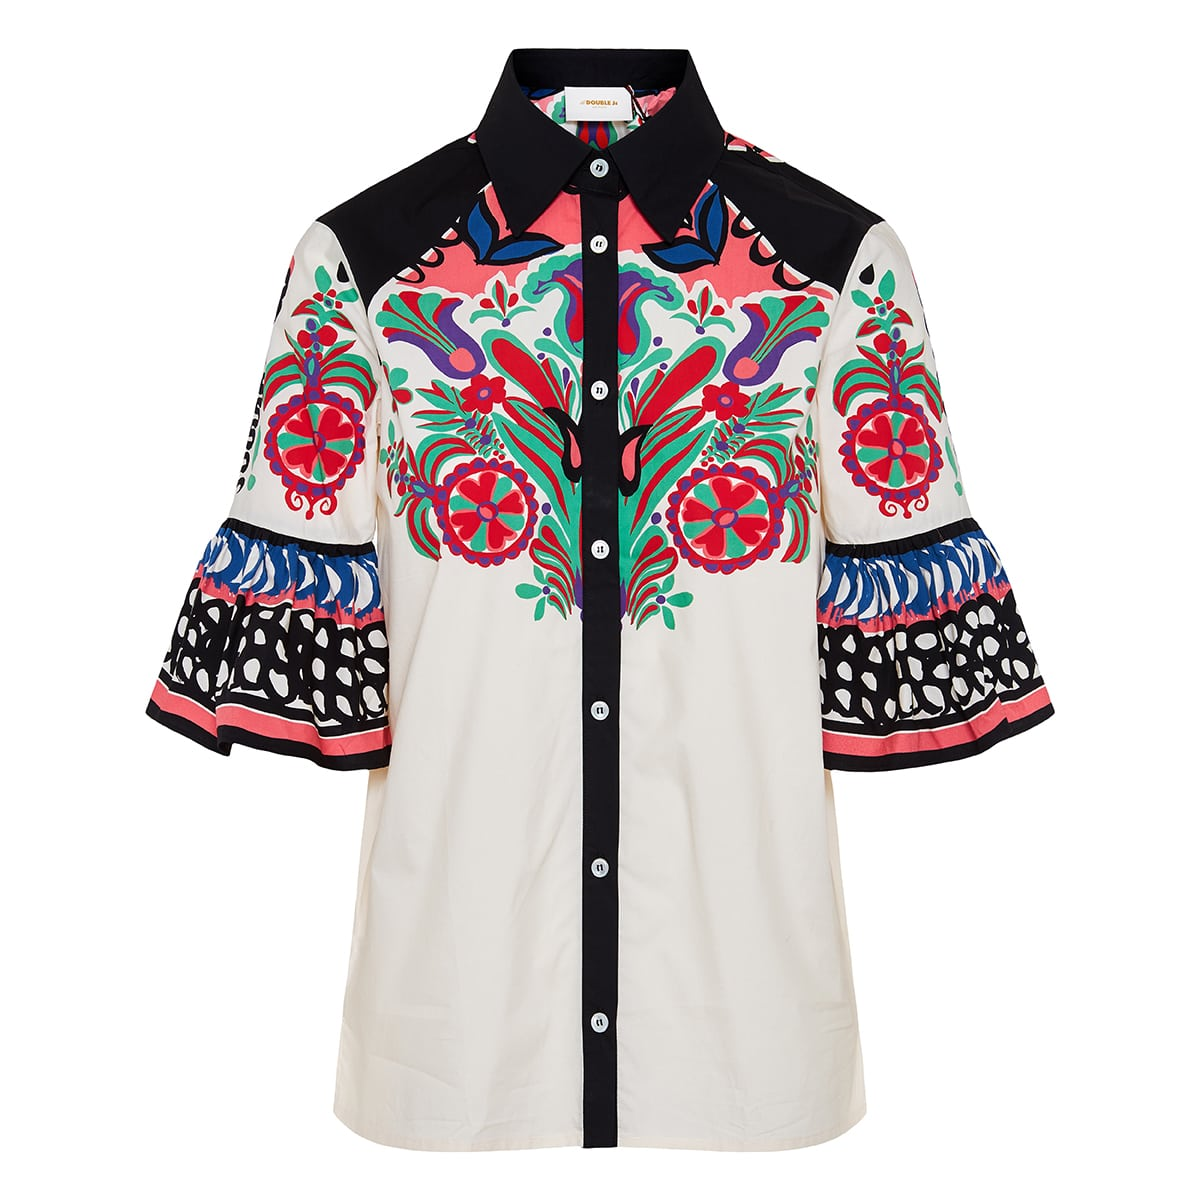 Choux printed poplin shirt